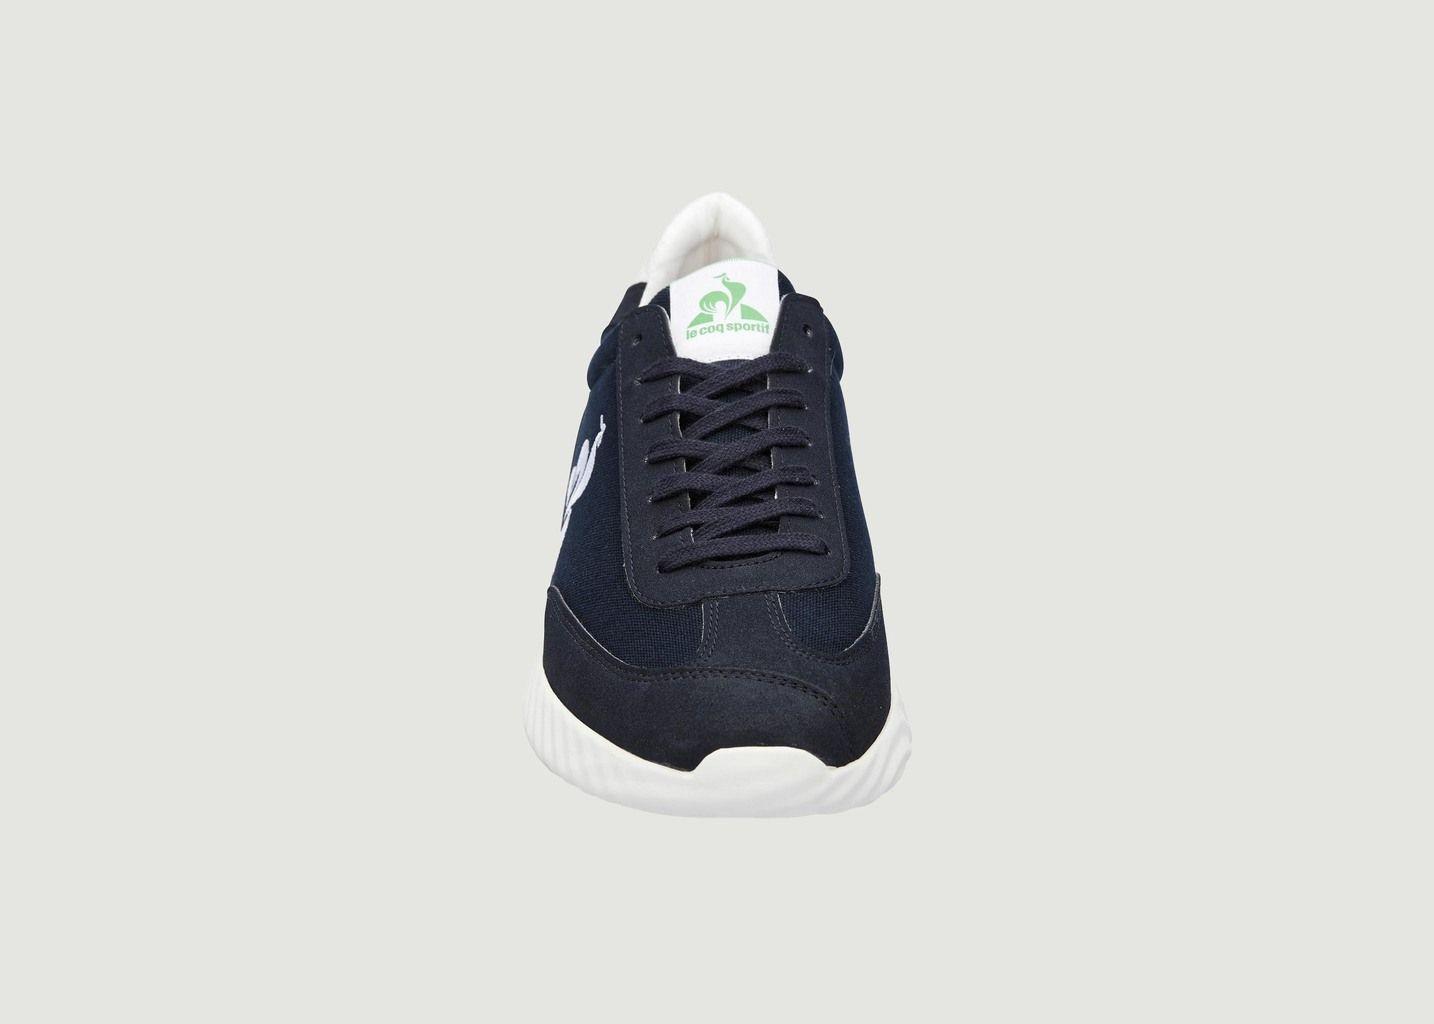 Chaussure Neree - Le Coq Sportif